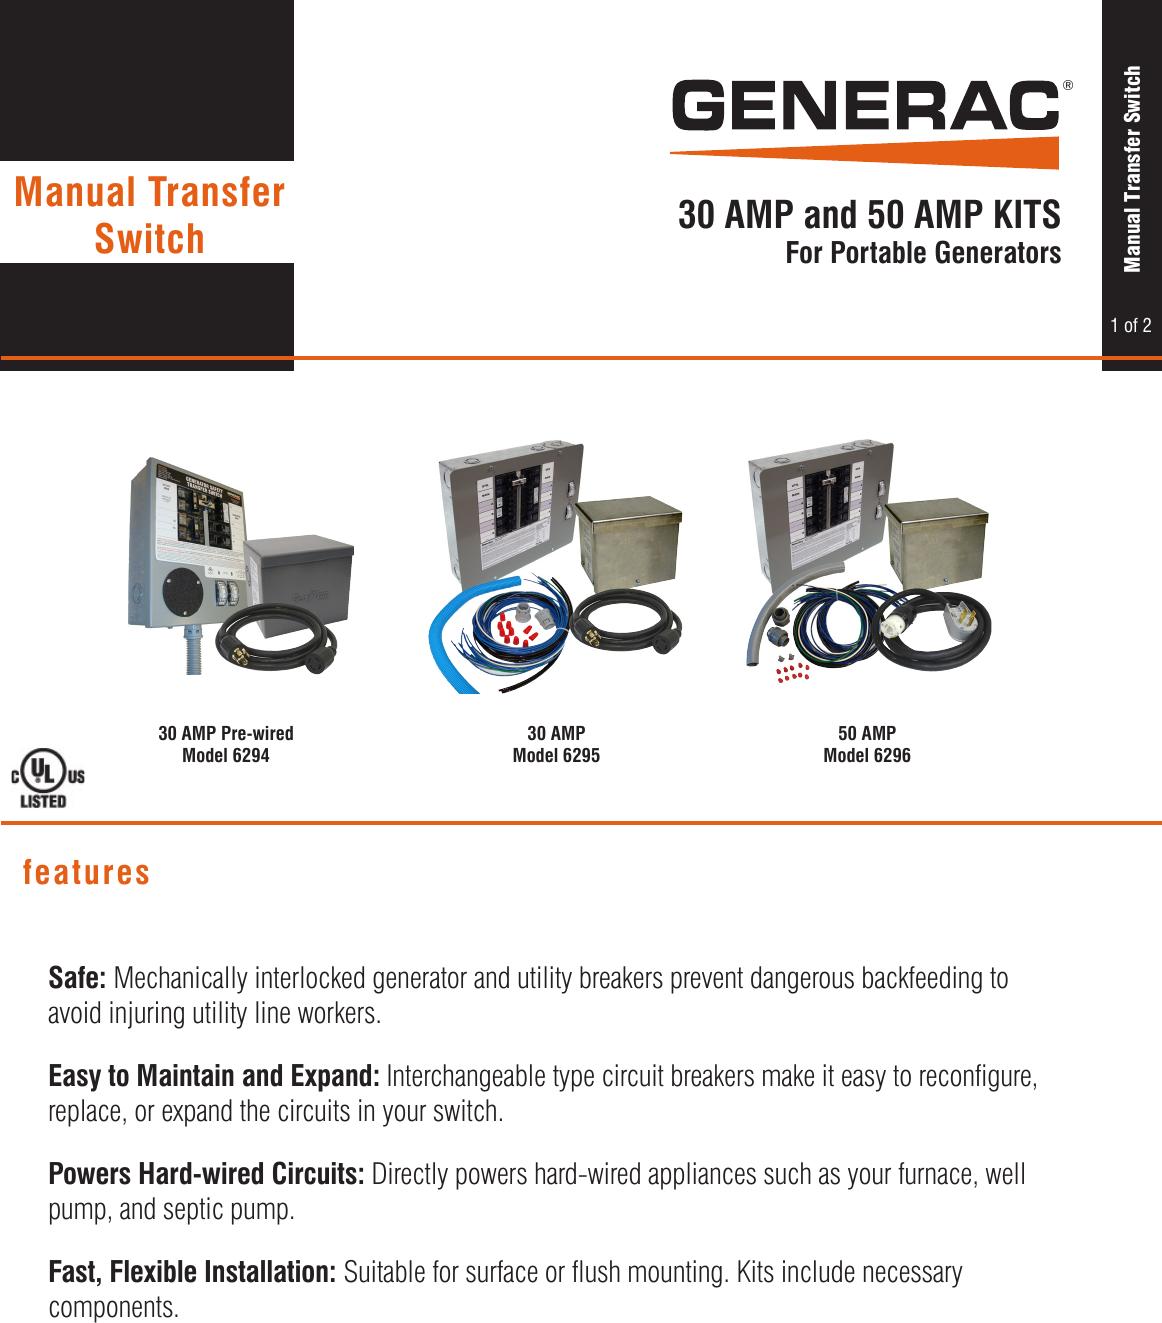 65719 1 Generac 6295 Brochure Wiring Harness Connectors